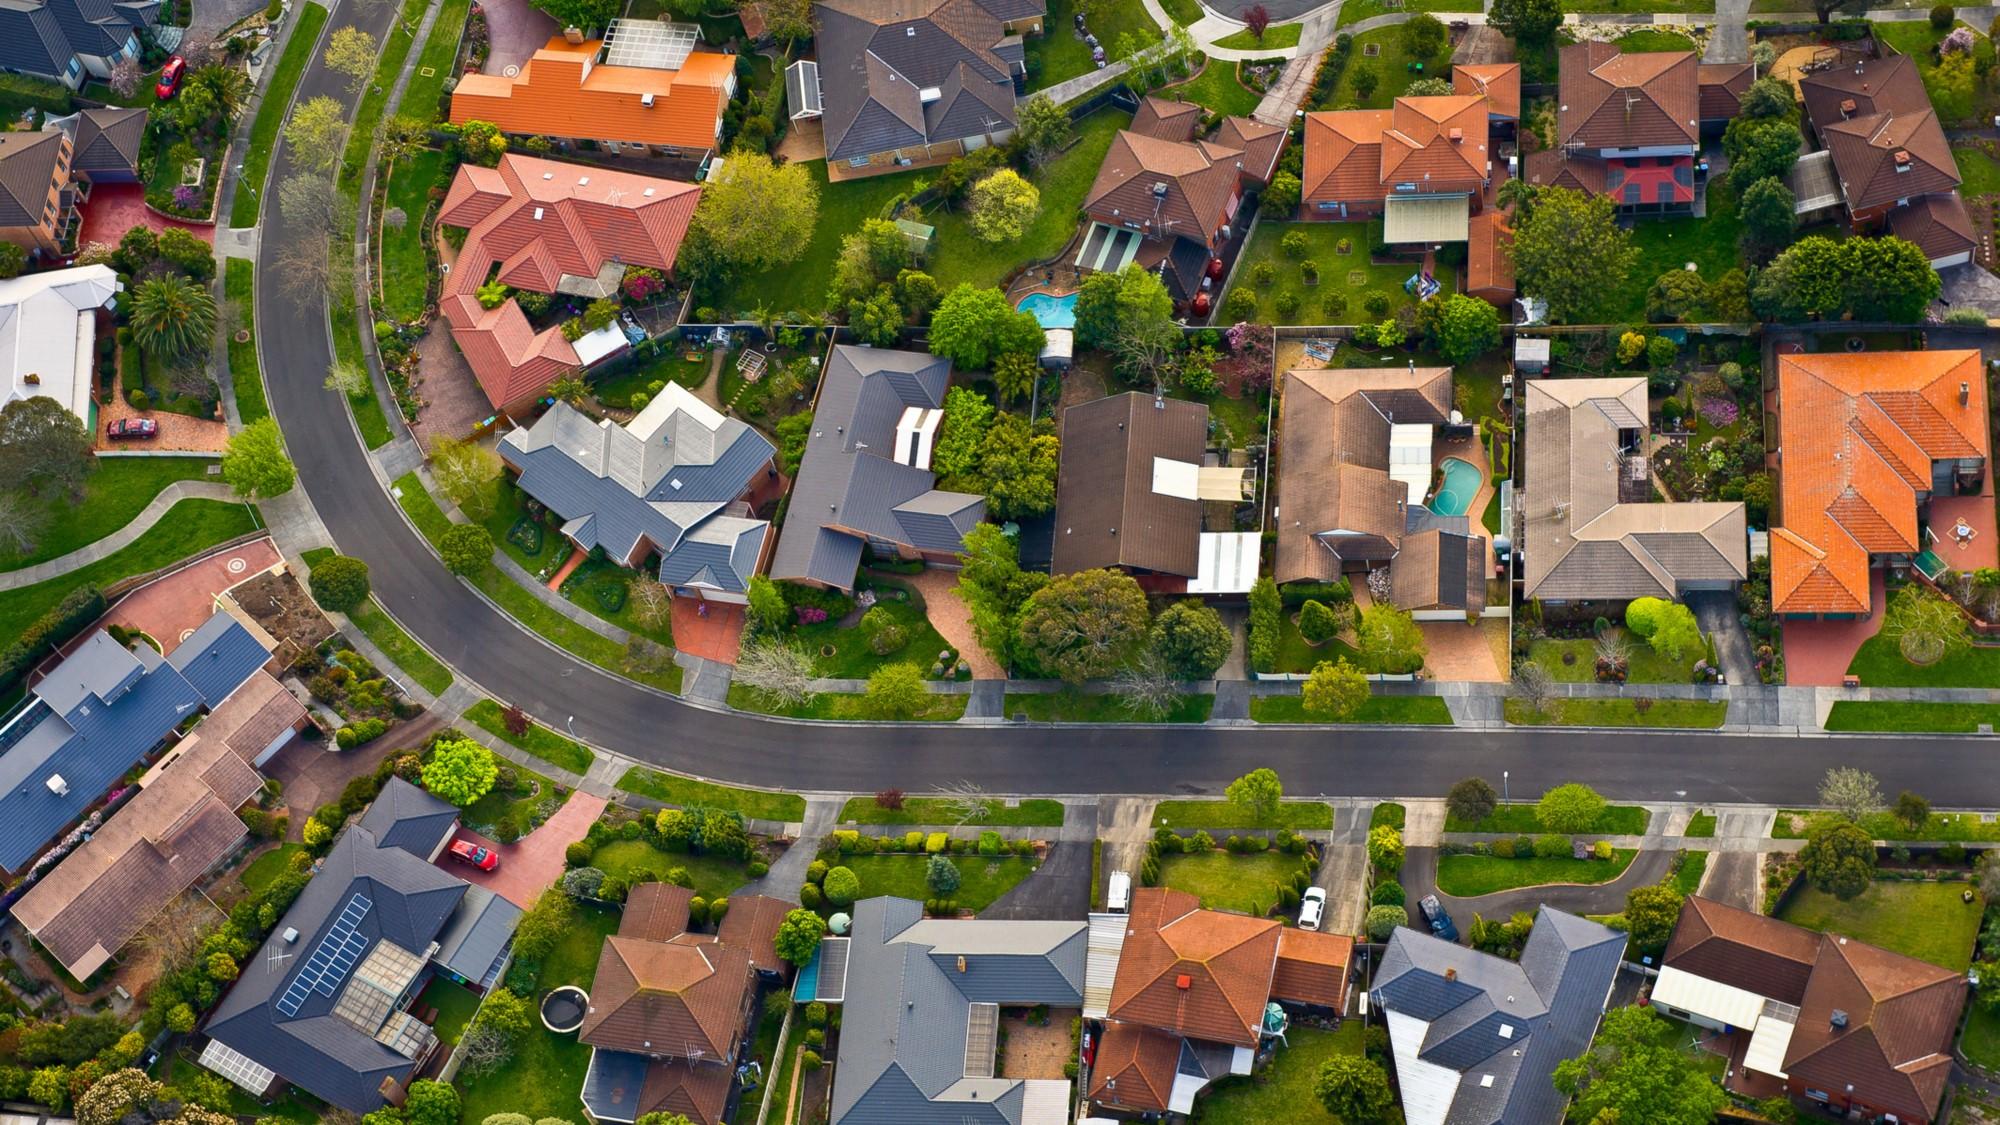 SUEZ aerial shot of households